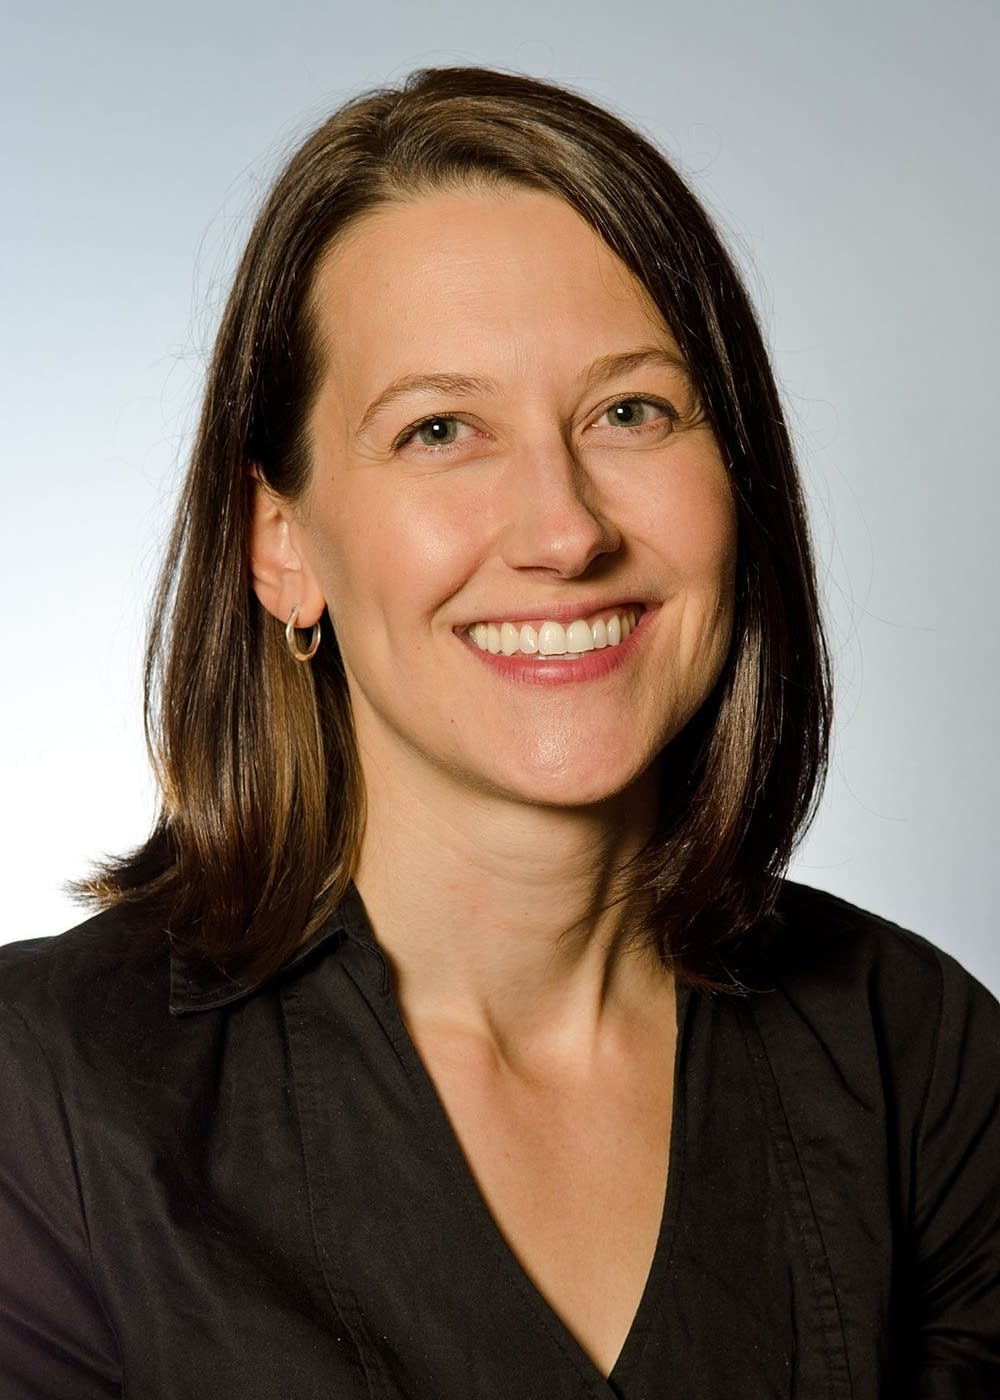 Kate Cimino